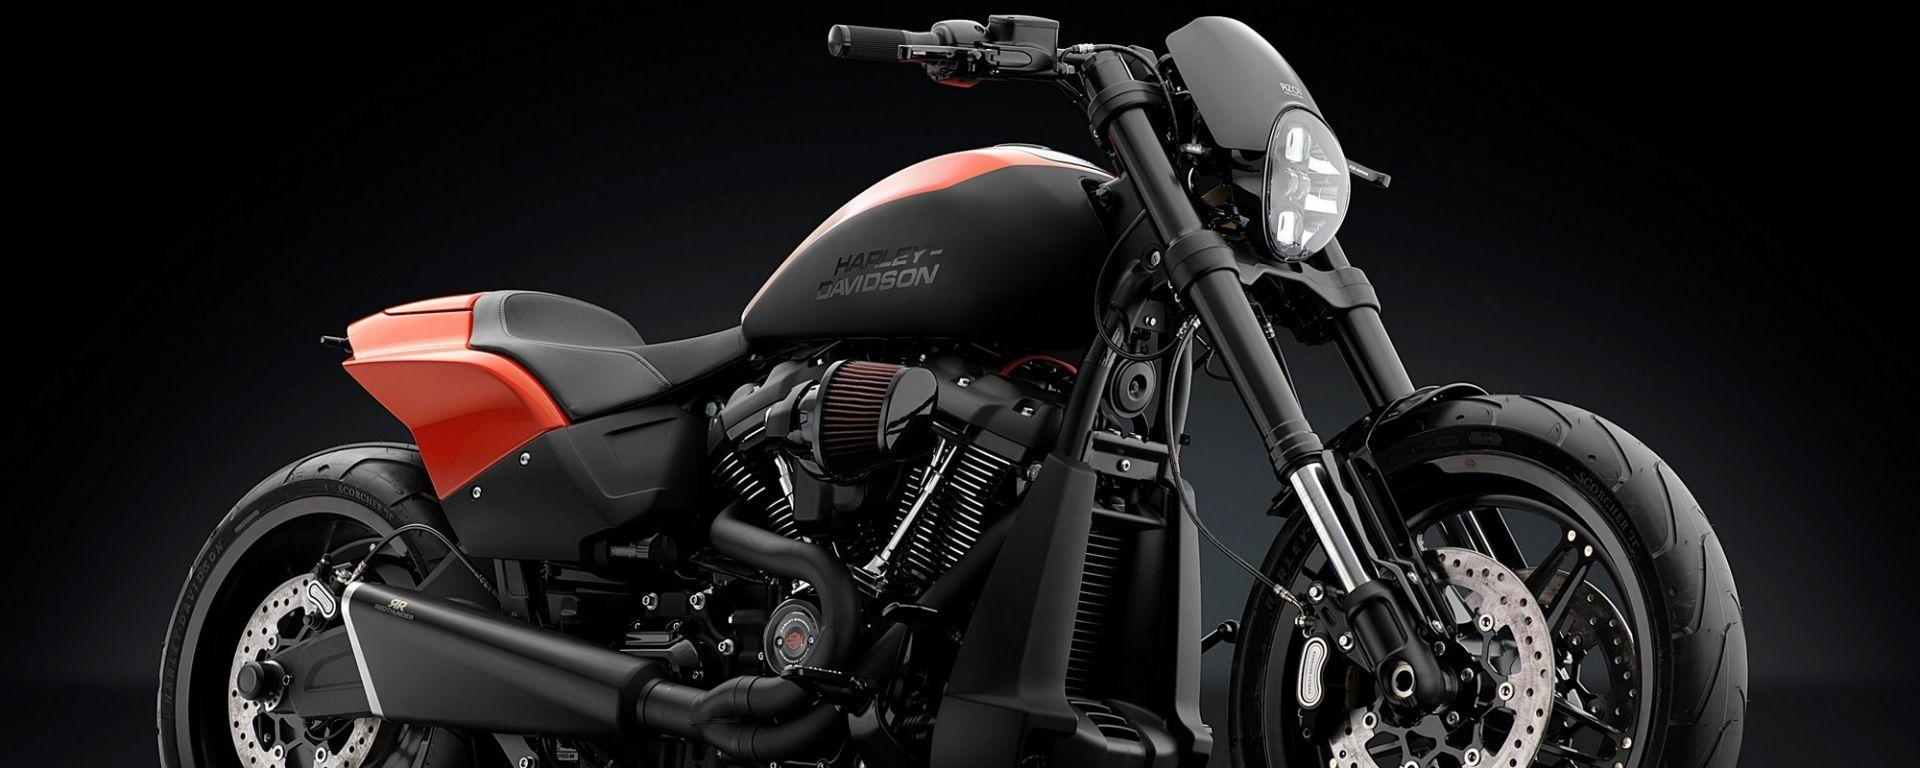 Rizoma rifà il look alla Harley Davidson Softail FXDR 114